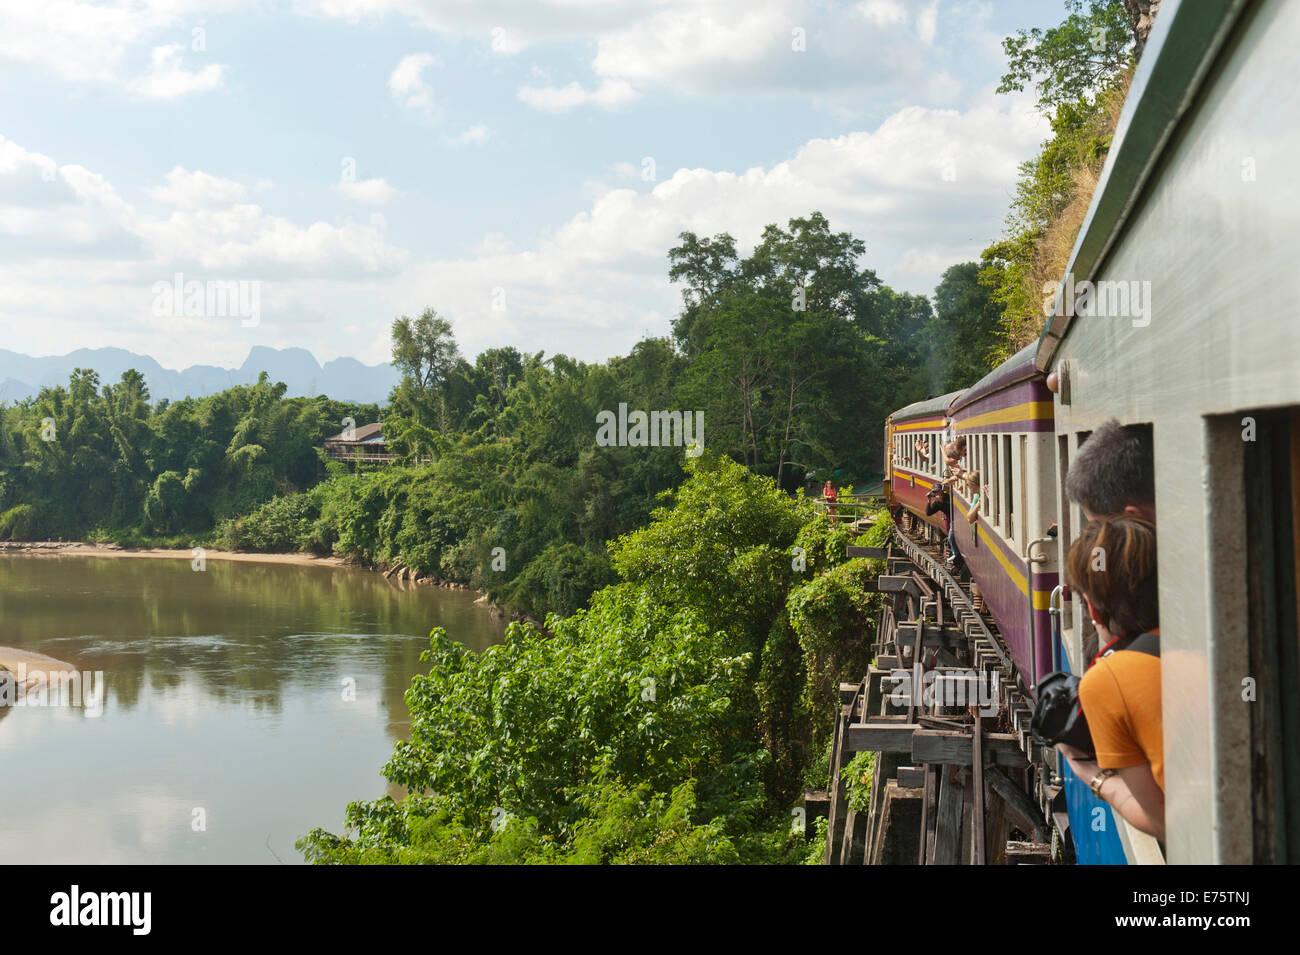 Historic railroad, train crossing the wooden bridge, railway